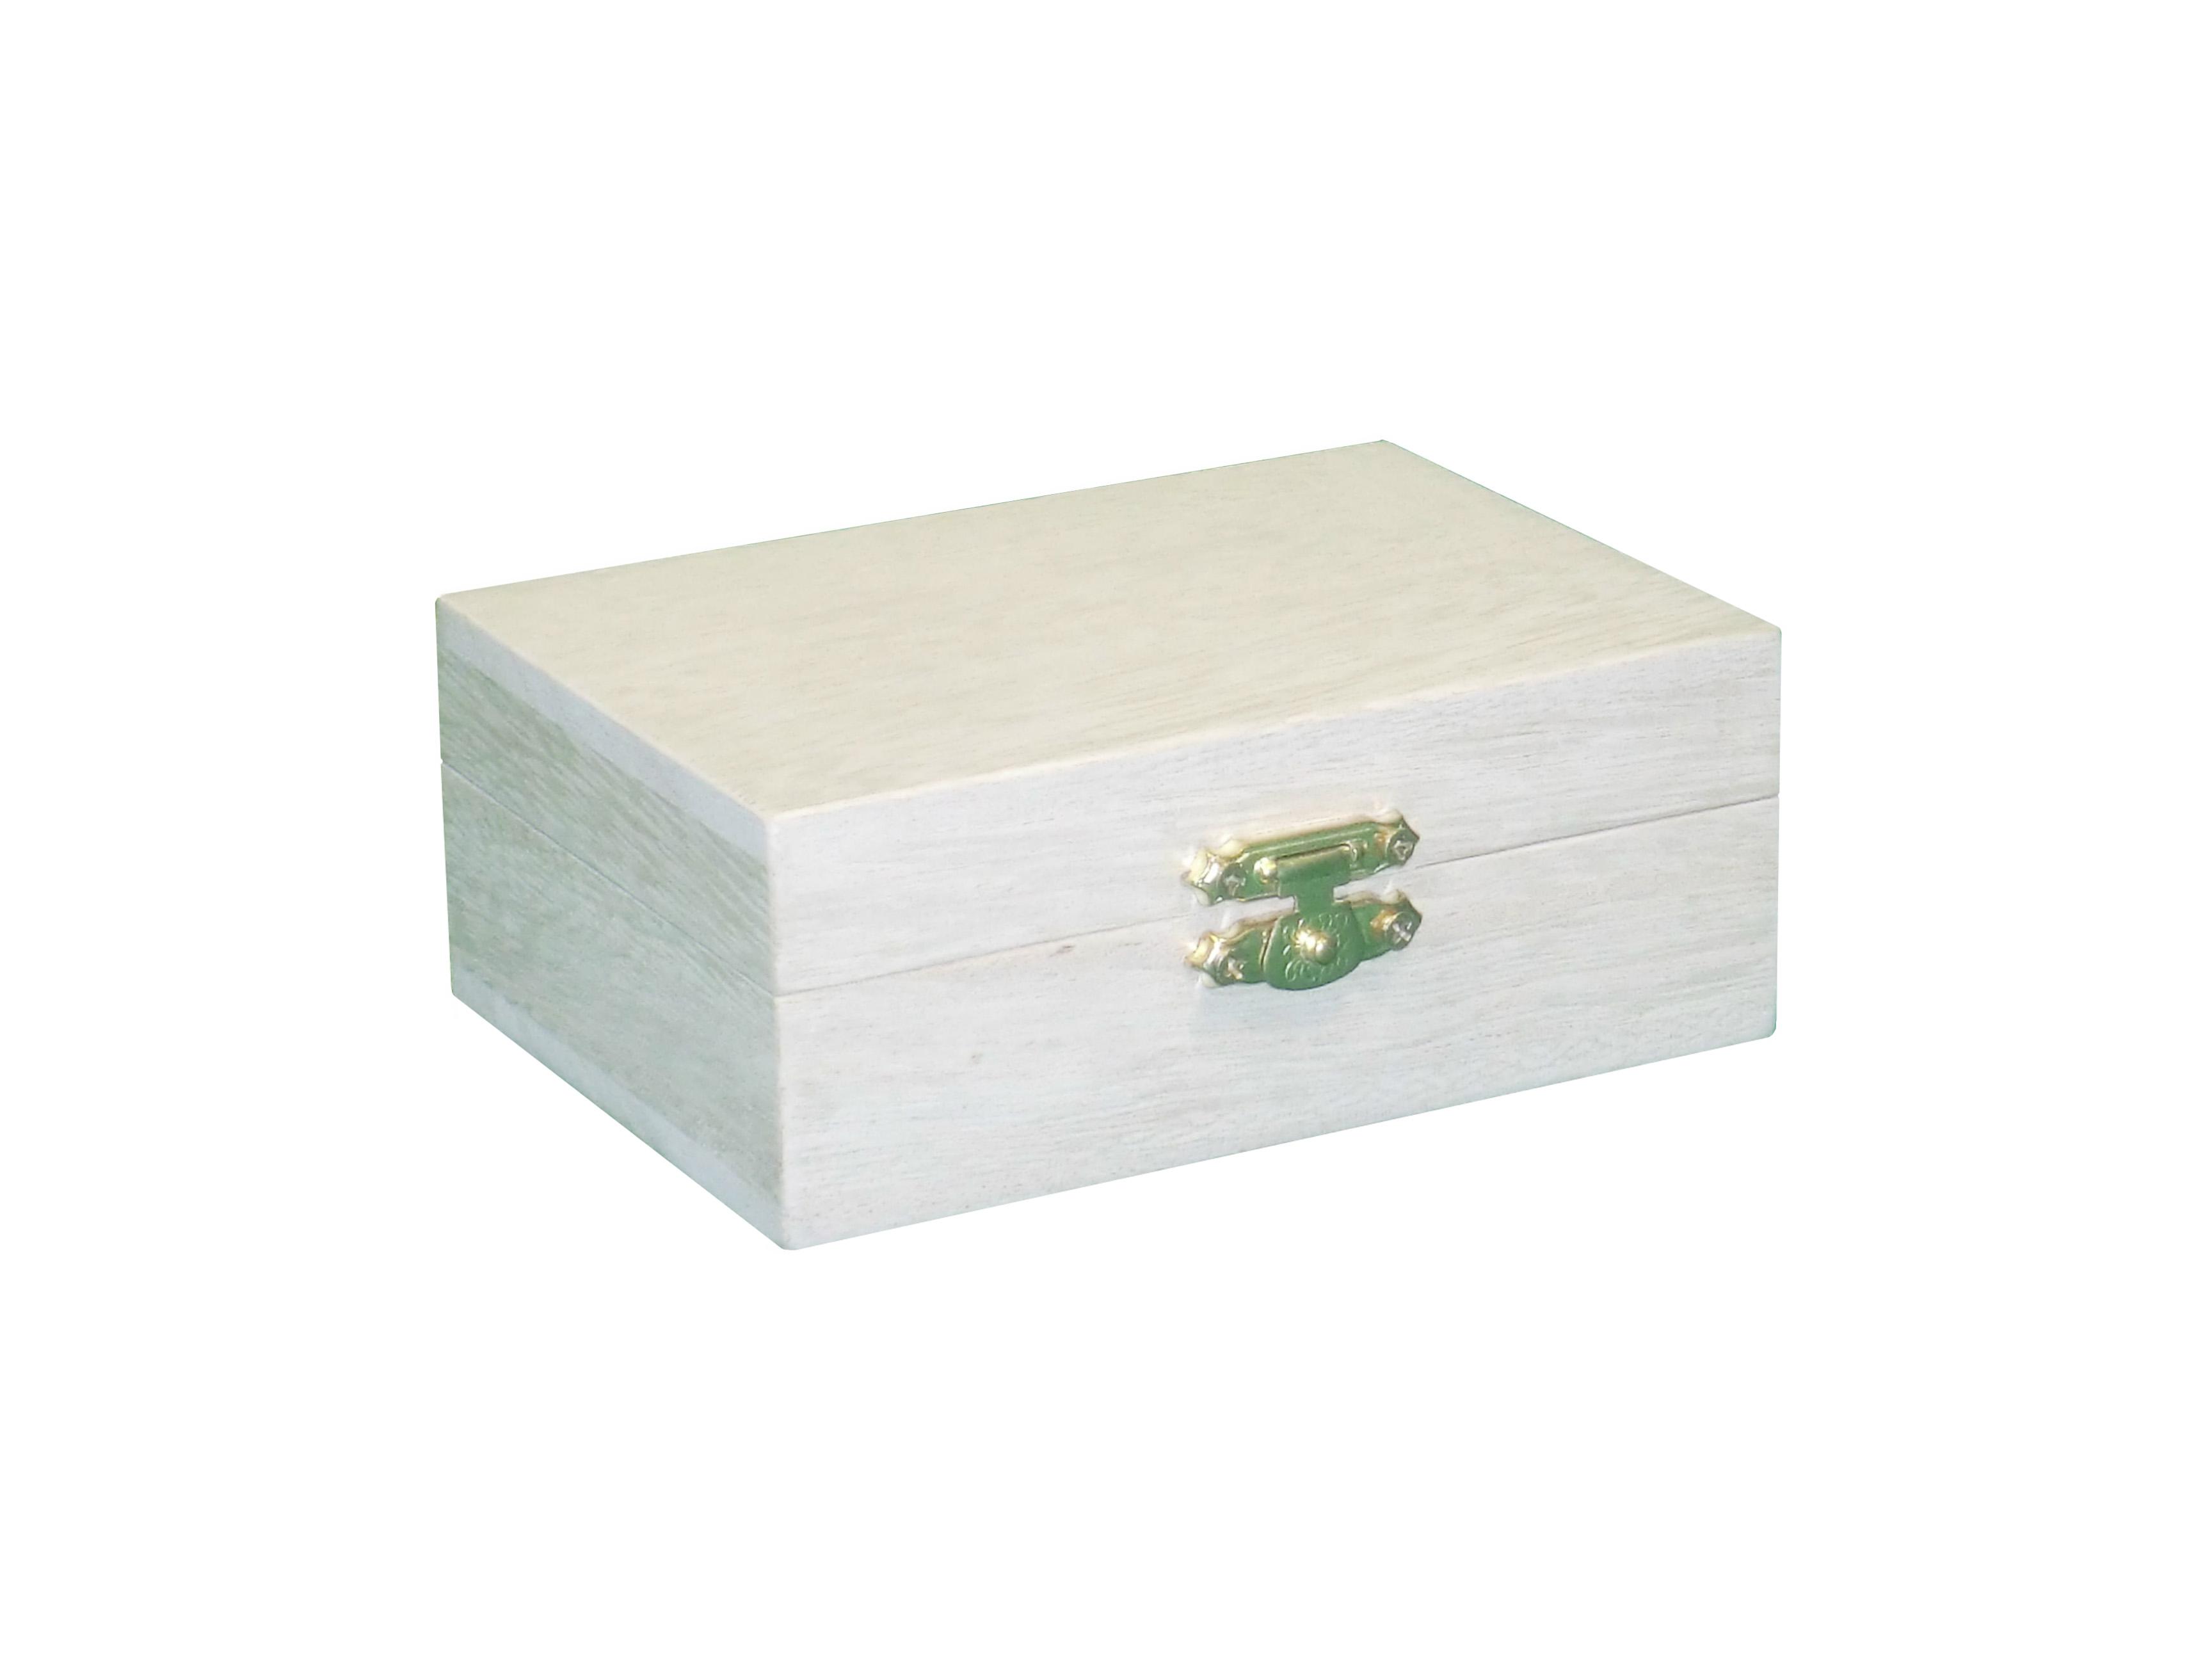 Merveilleux Small Storage Box W/ Hinged Lid